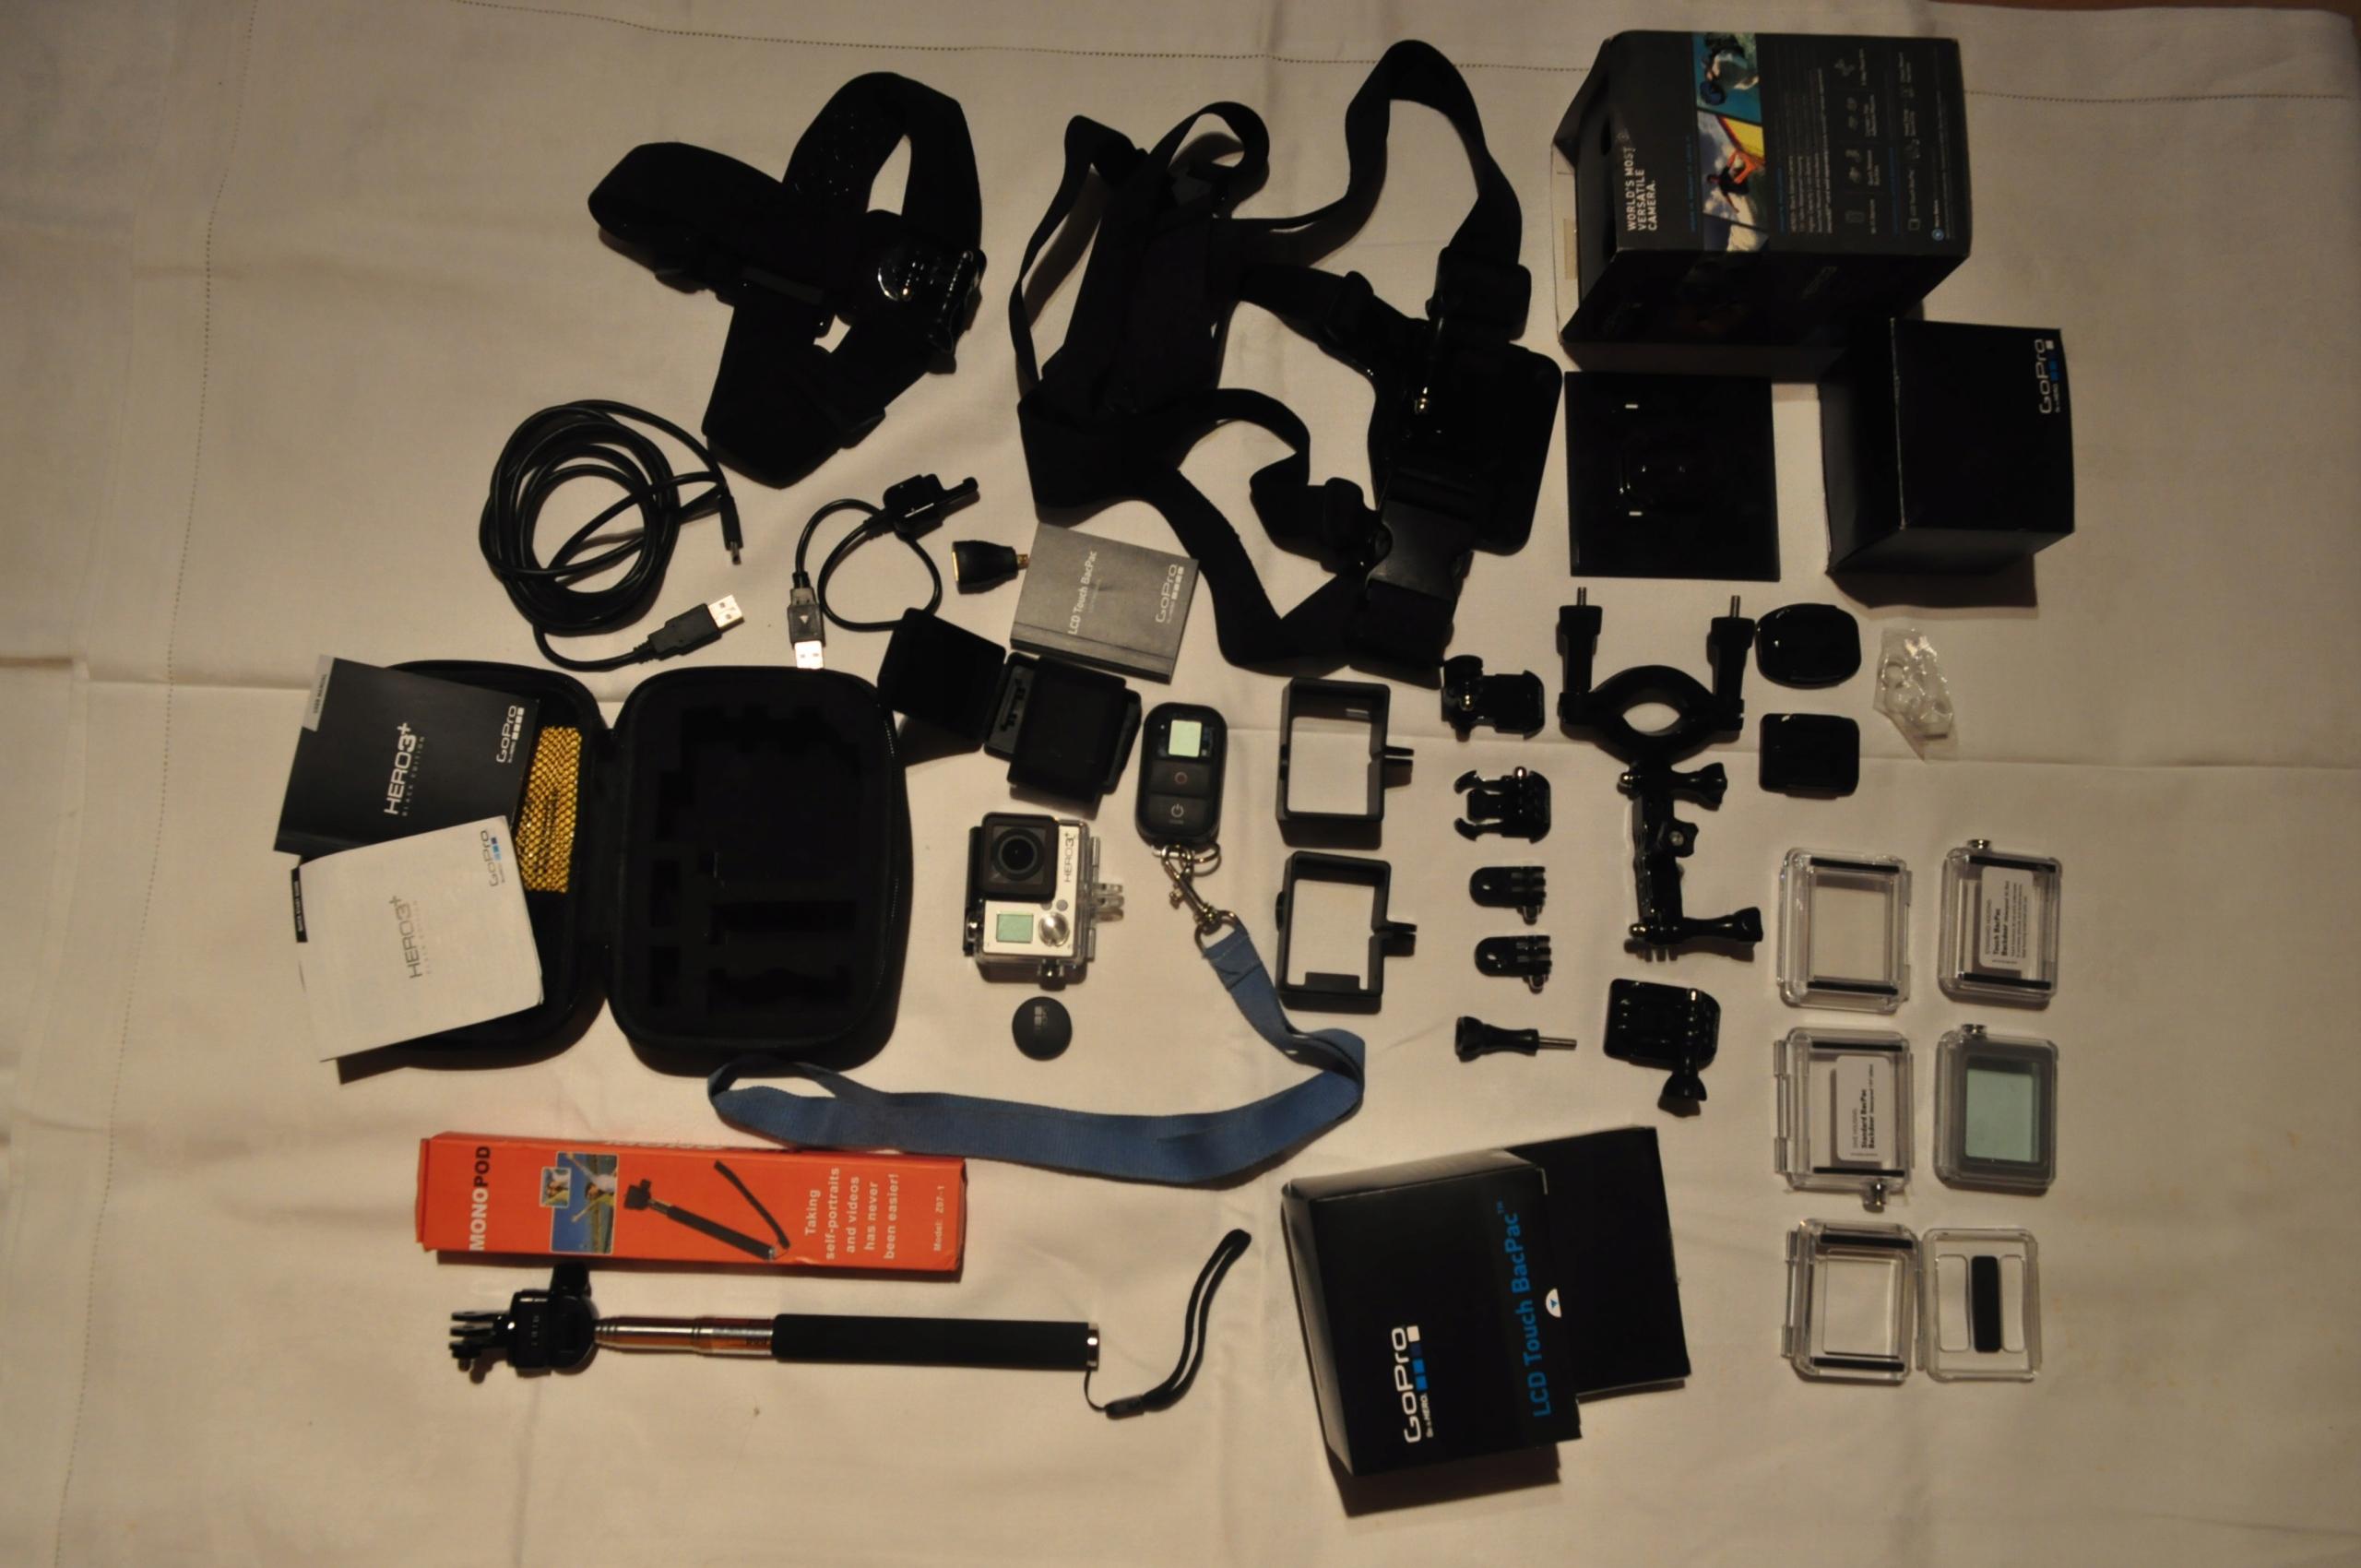 Kamera GOPRO HERO 3+ BLACK EDITION i mega zestaw